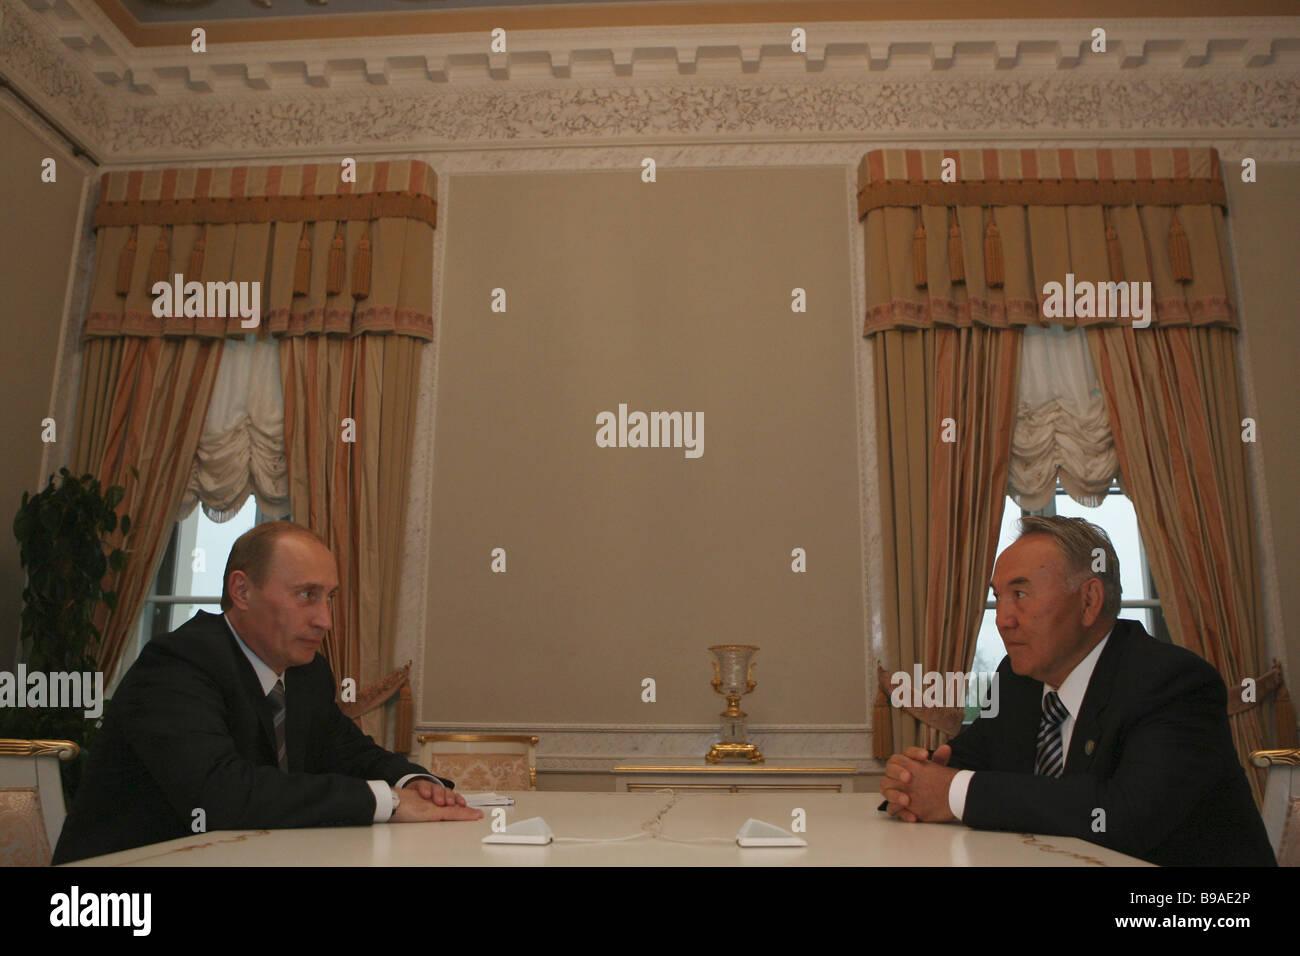 Bilateral meeting between President Vladimir Putin of Russia left and President Nursultan Nazarbayev of Kazakhstan - Stock Image